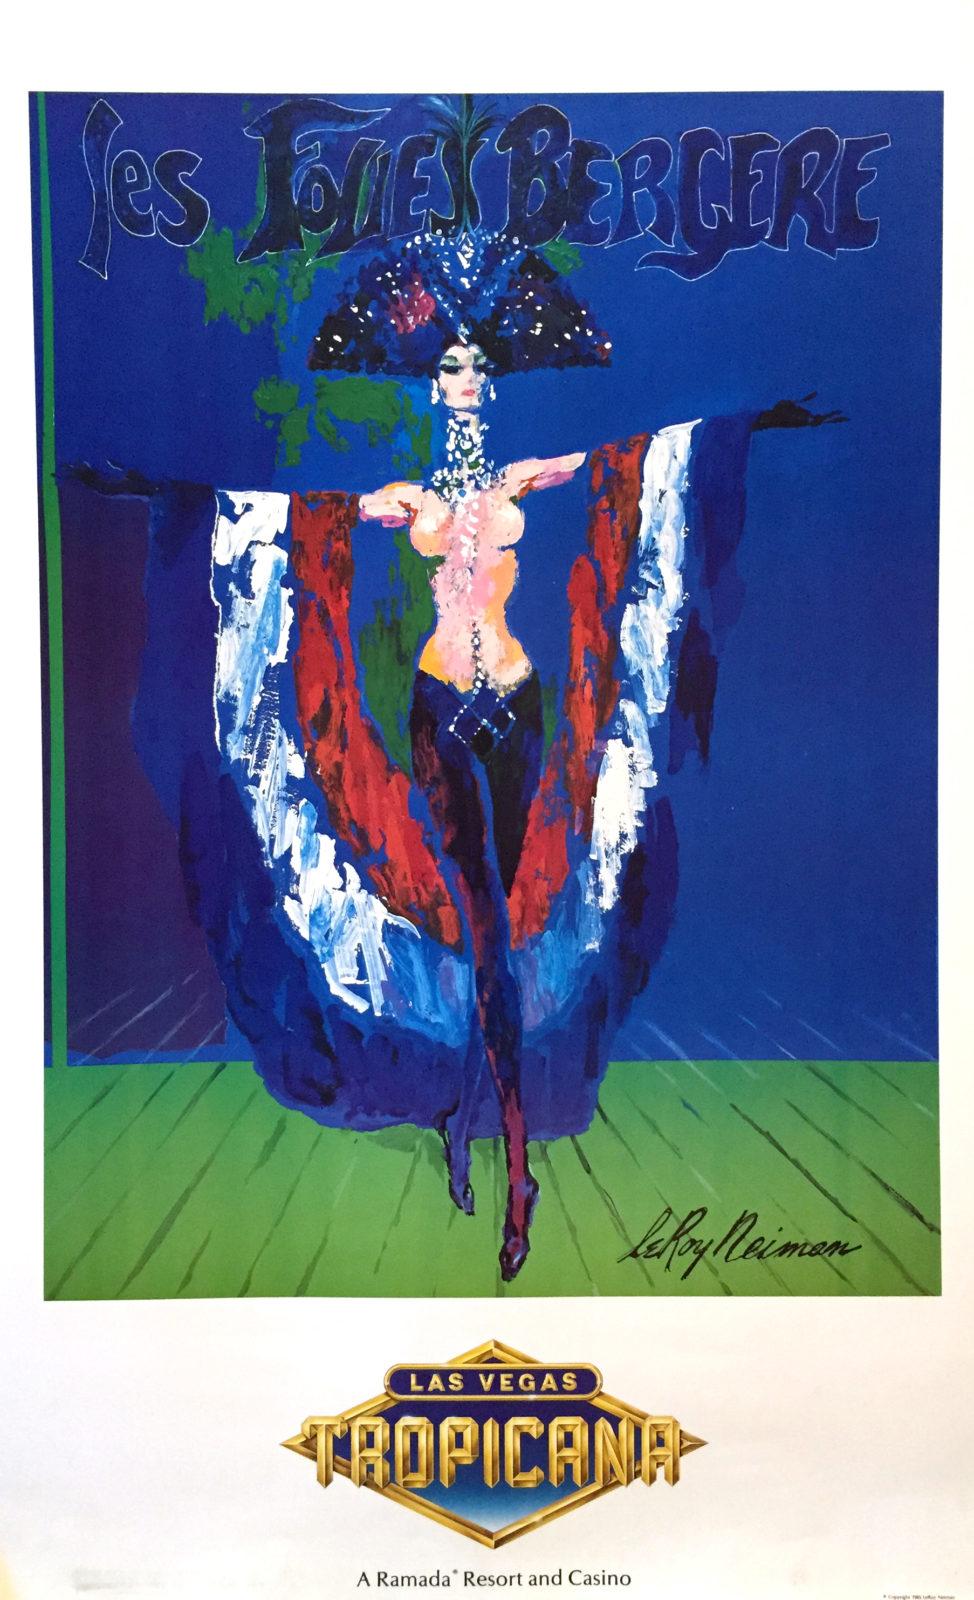 Les Folies Bergere - Las Vegas, Tropicana poster